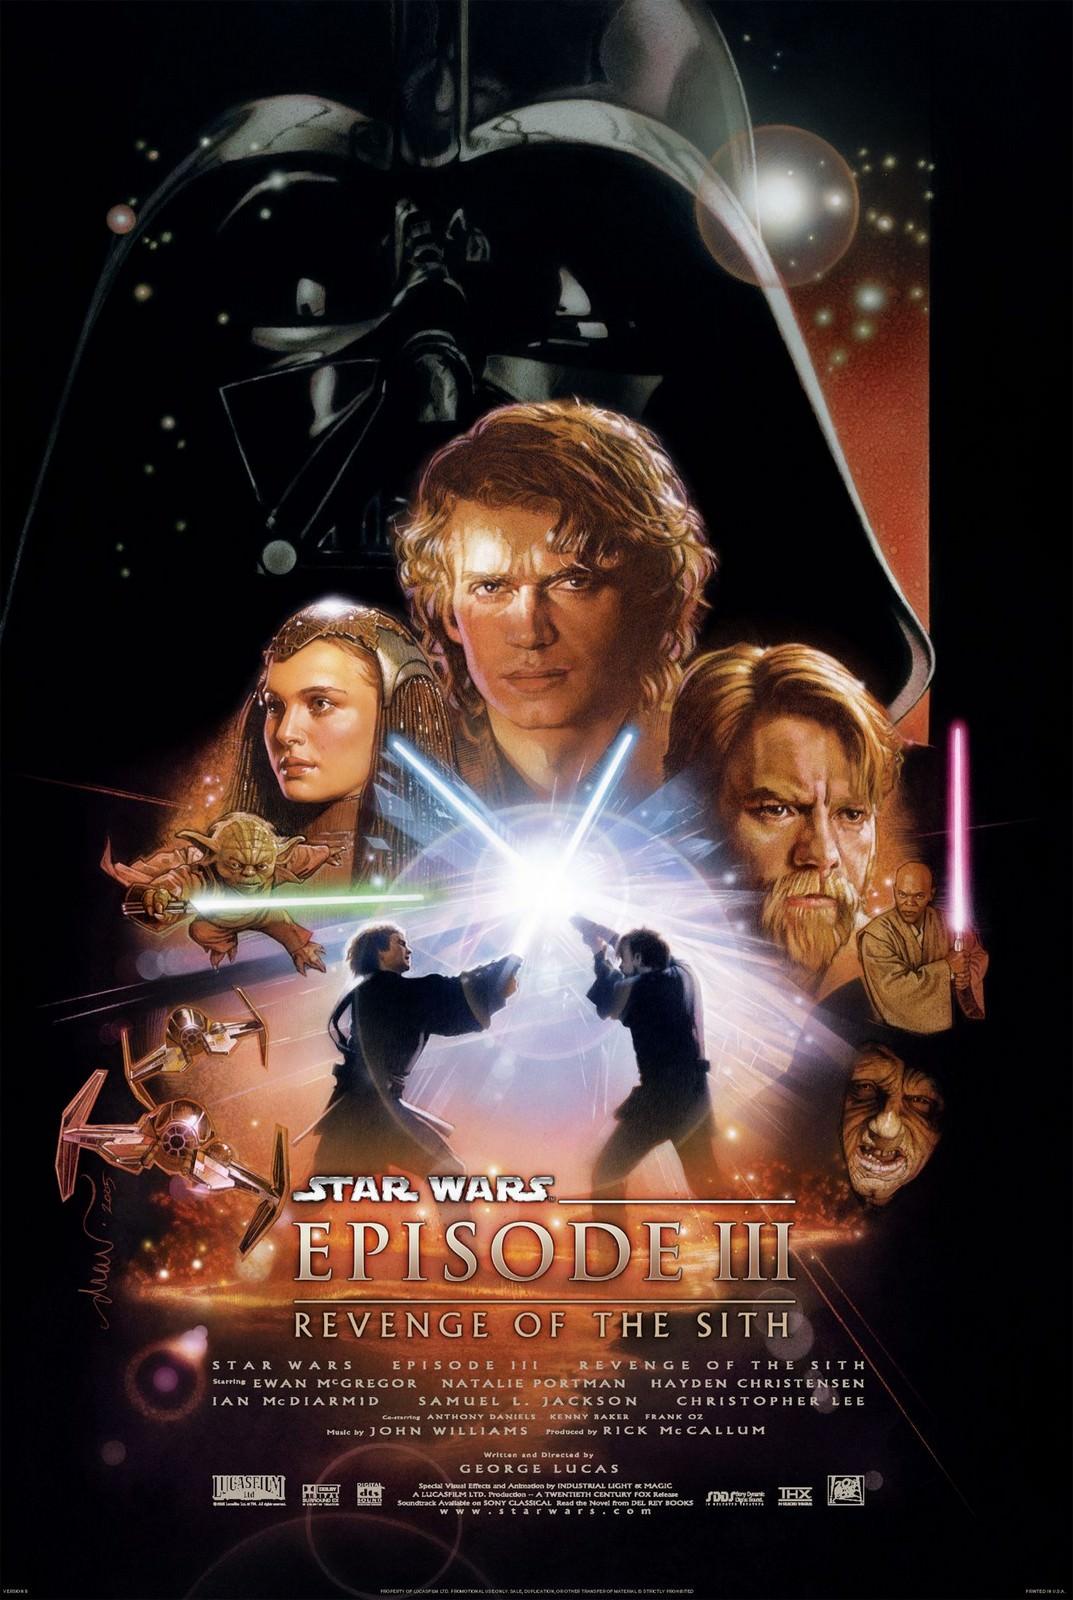 Movie, Star Wars Episode III: Revenge of the Sith(美國, 2005) / 星際大戰三部曲:西斯大帝的復仇(台灣) / 星球大战前传:西斯的复仇(中國) / 星球大戰前傳:黑帝君臨(香港), 電影海報, 美國